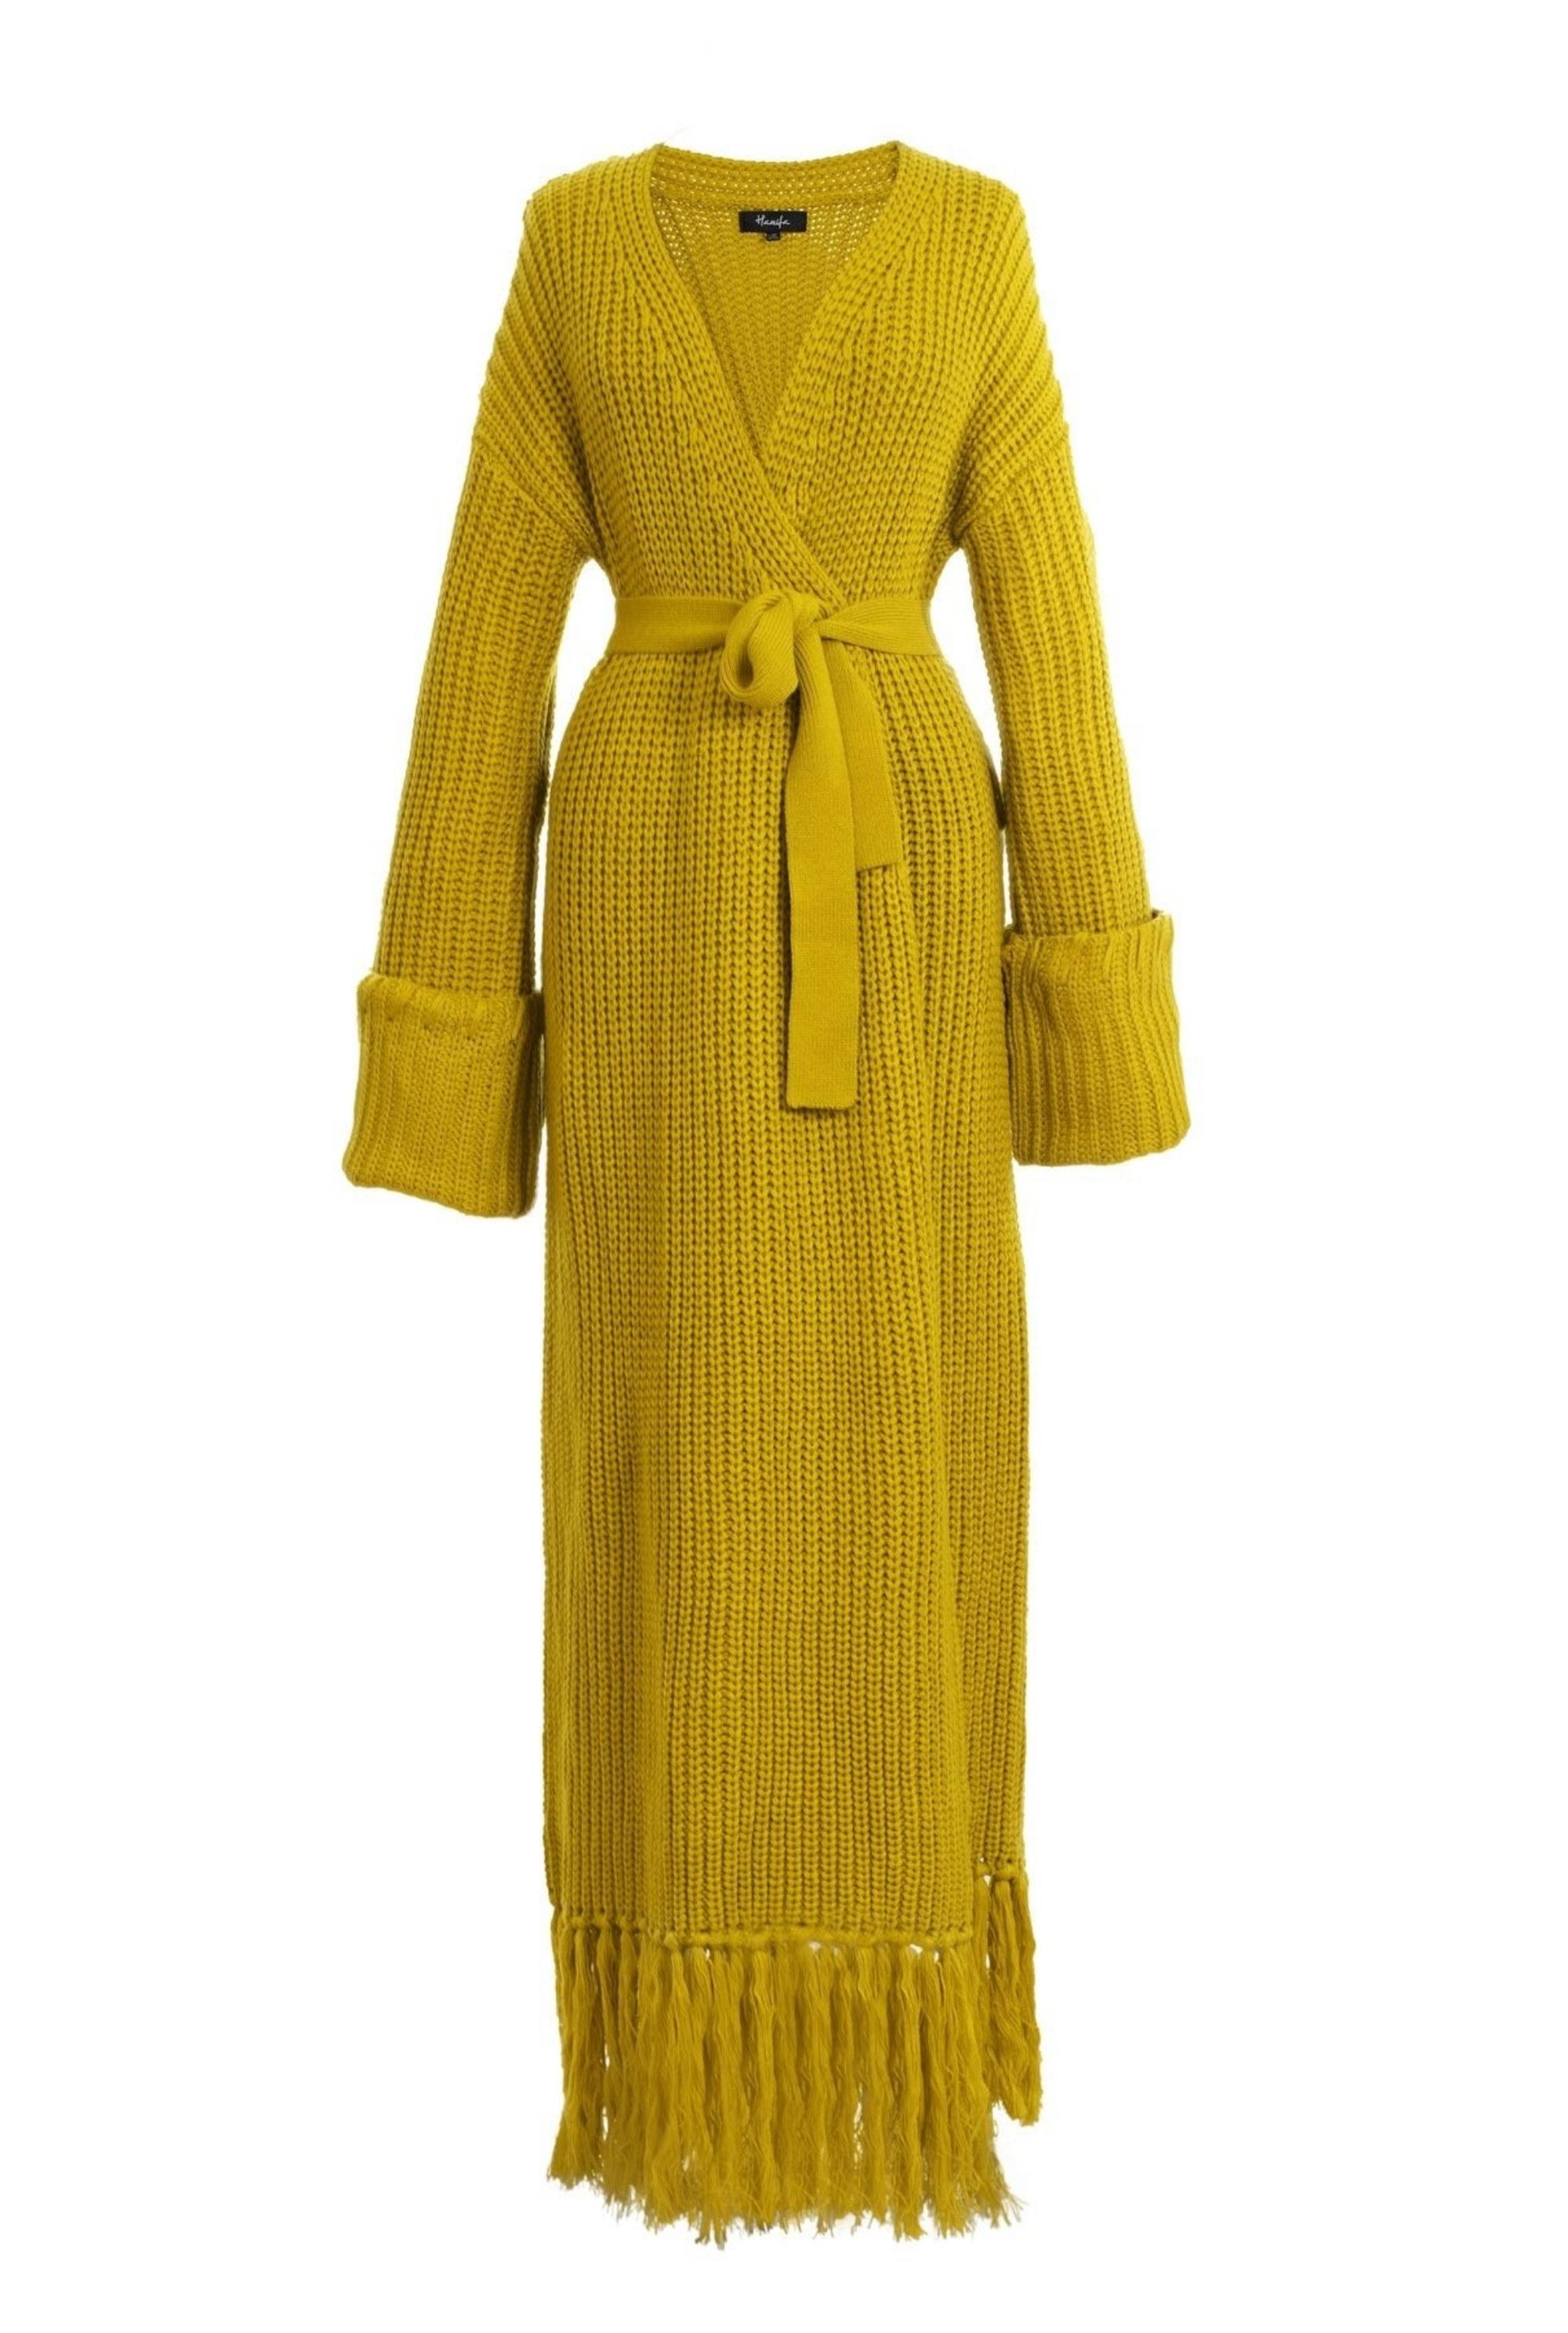 the mustard yellow cardigan dress